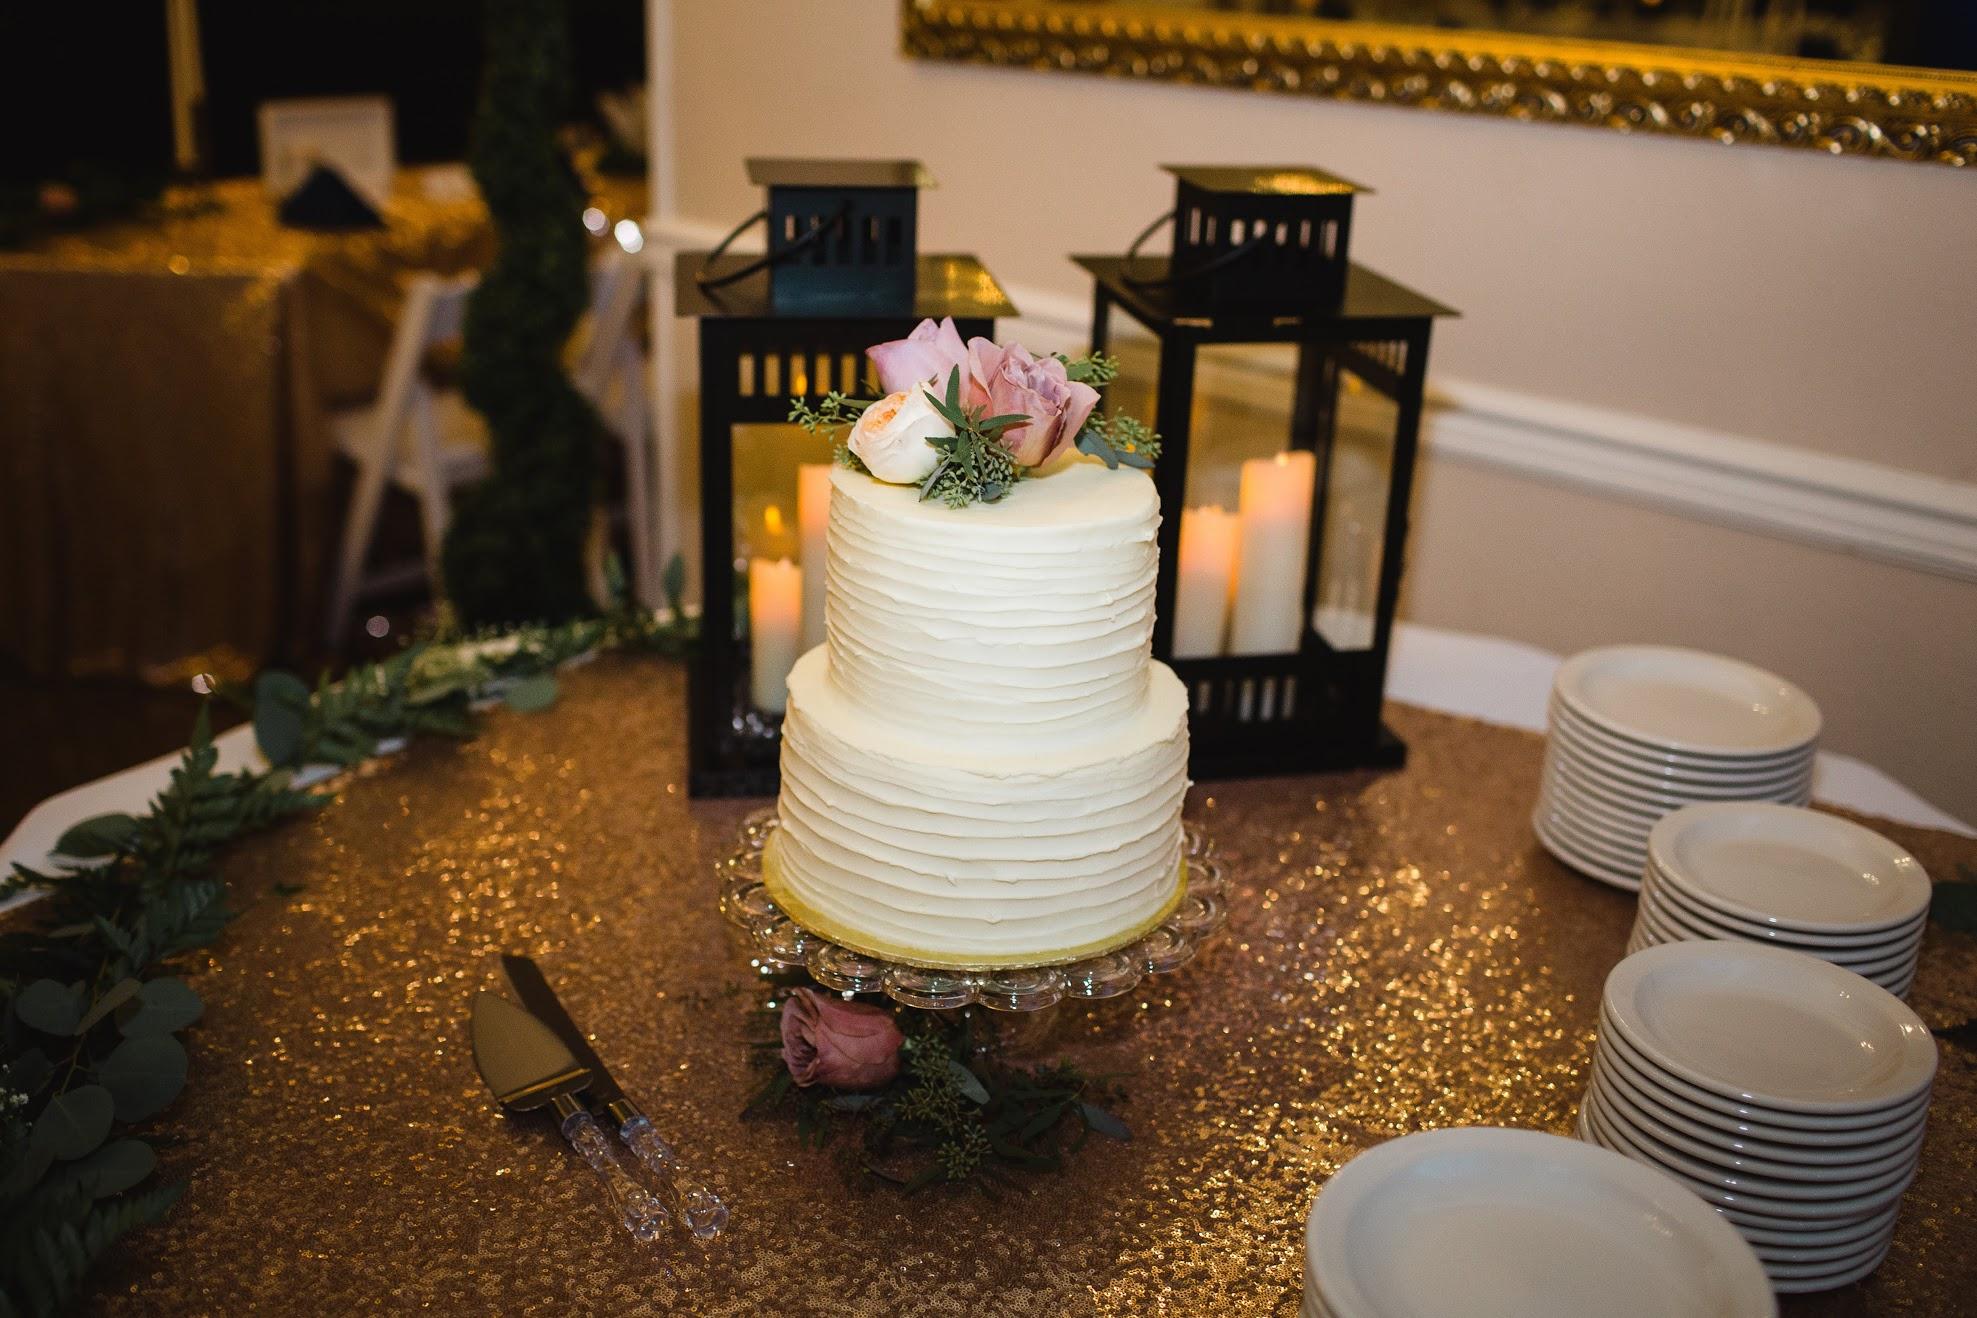 L Cake.jpg